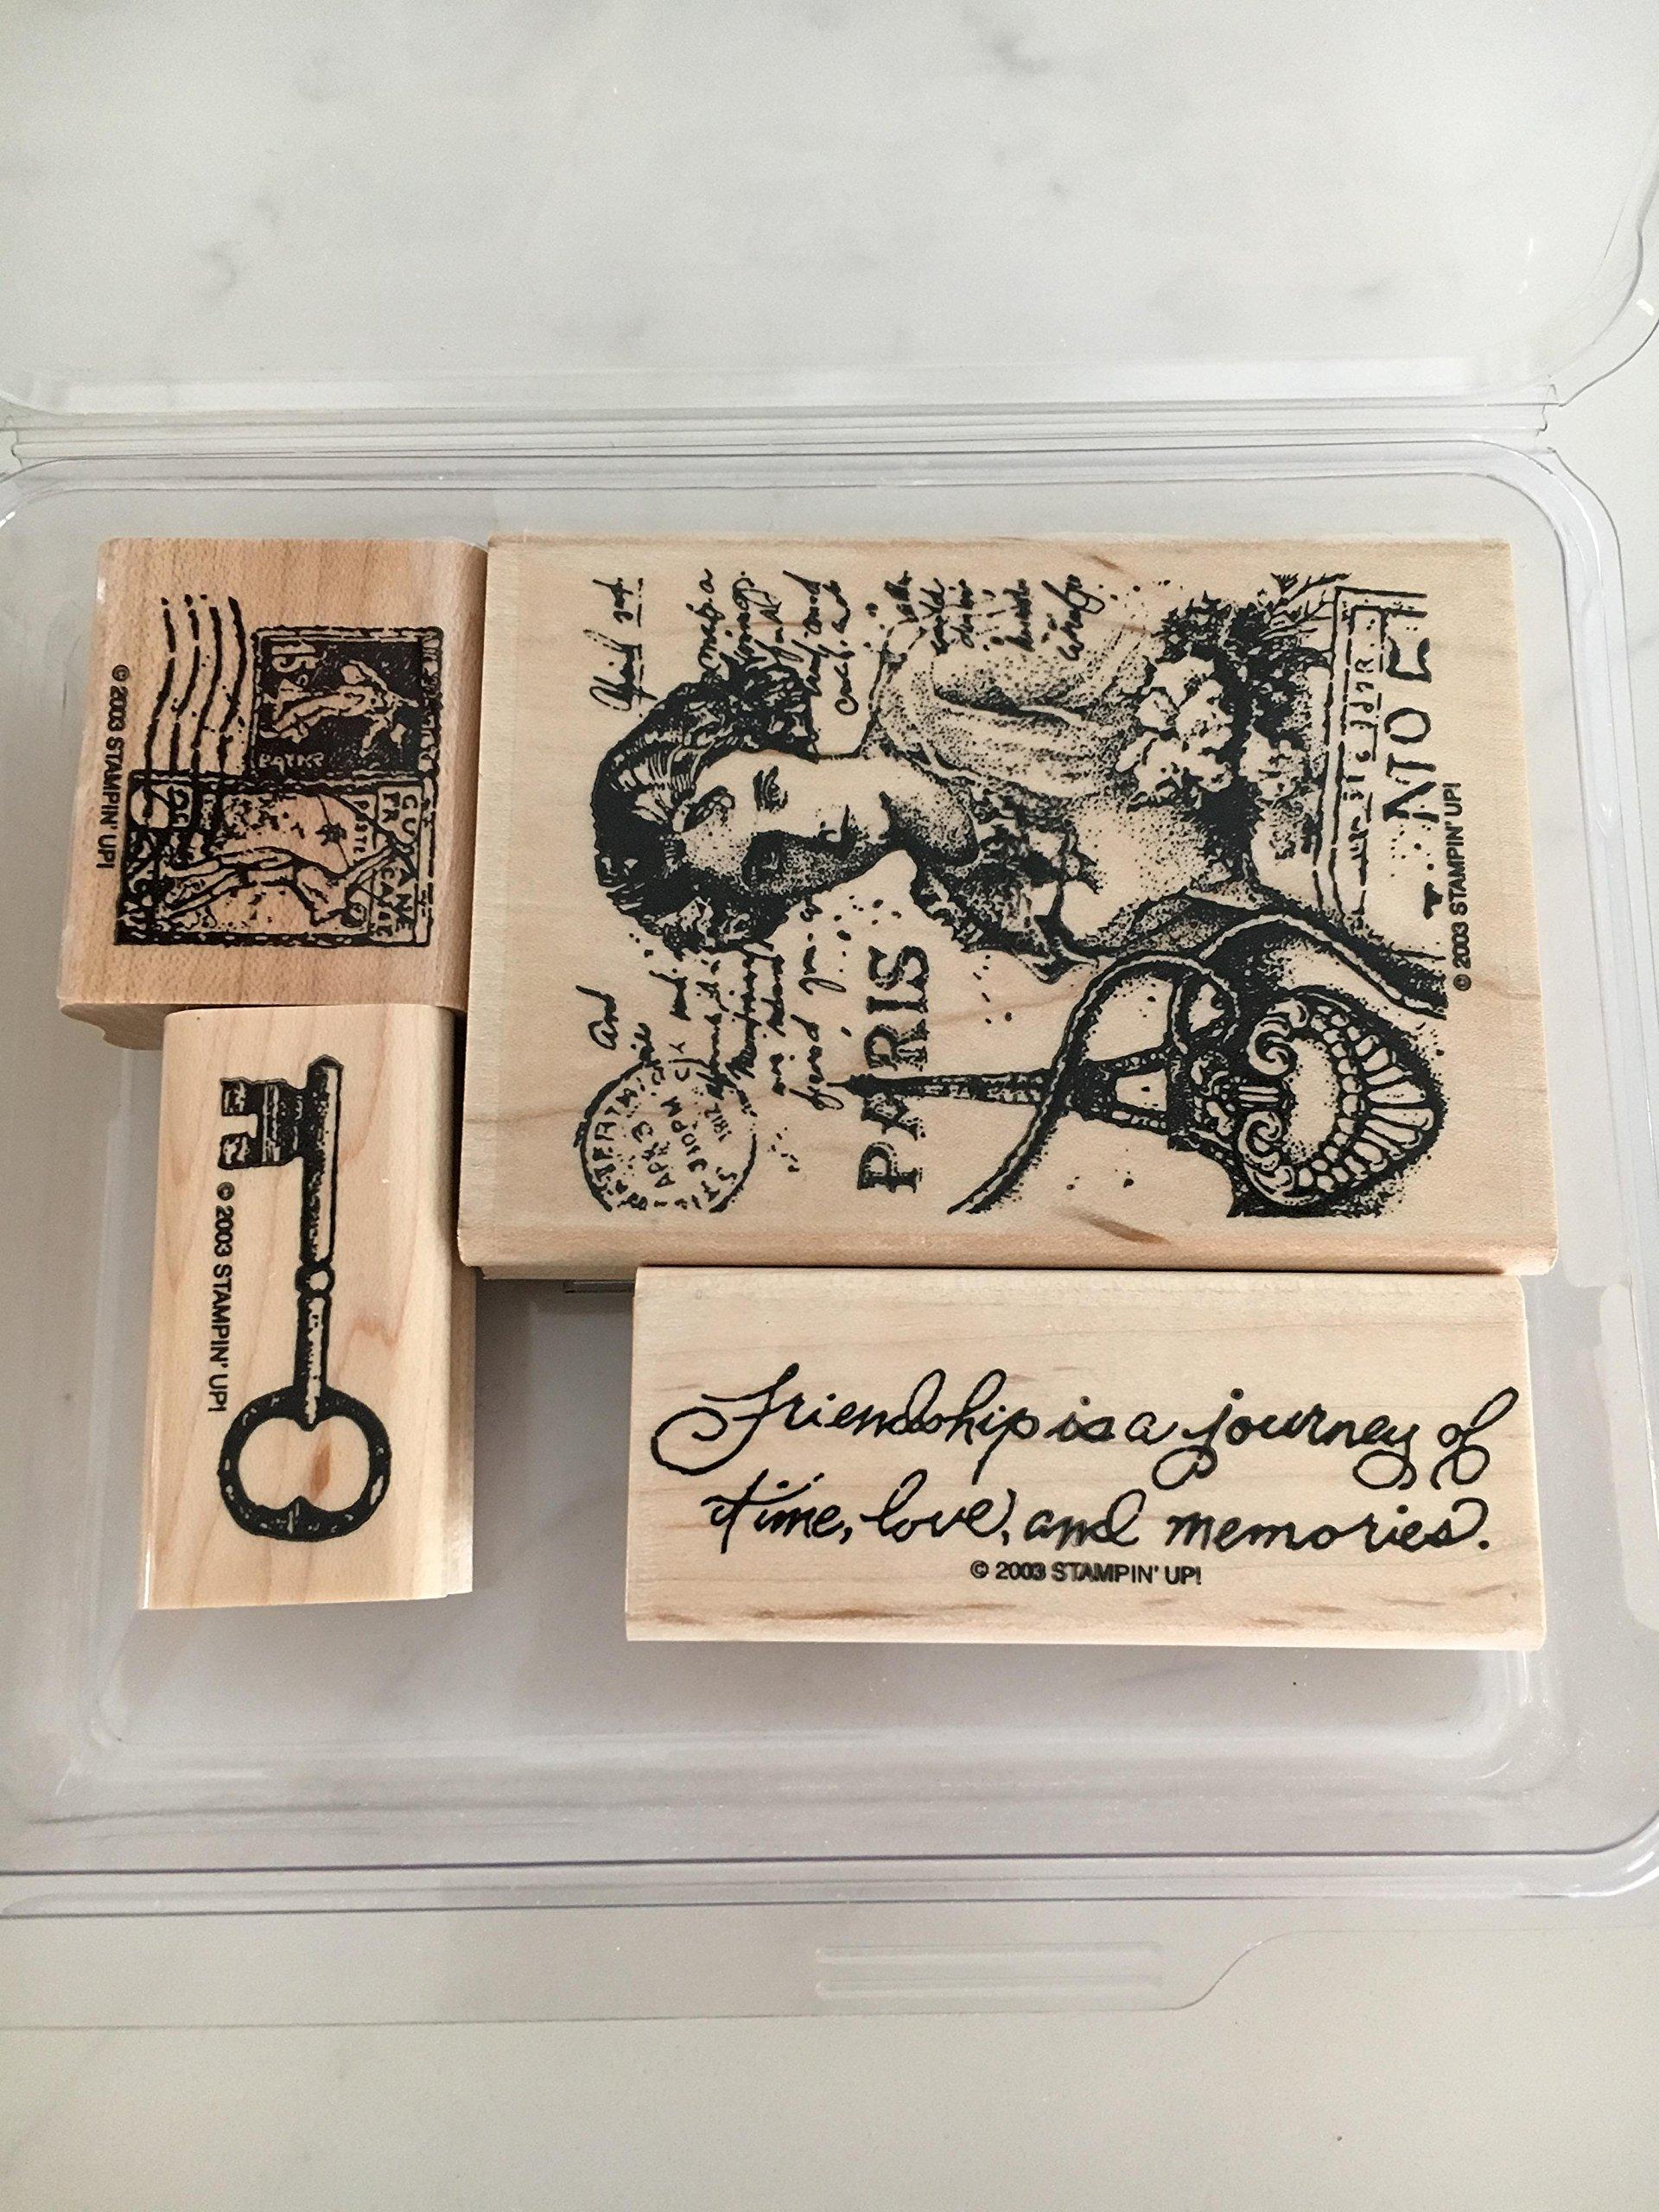 Stampin Up! Friendship's Journey Stamp Set